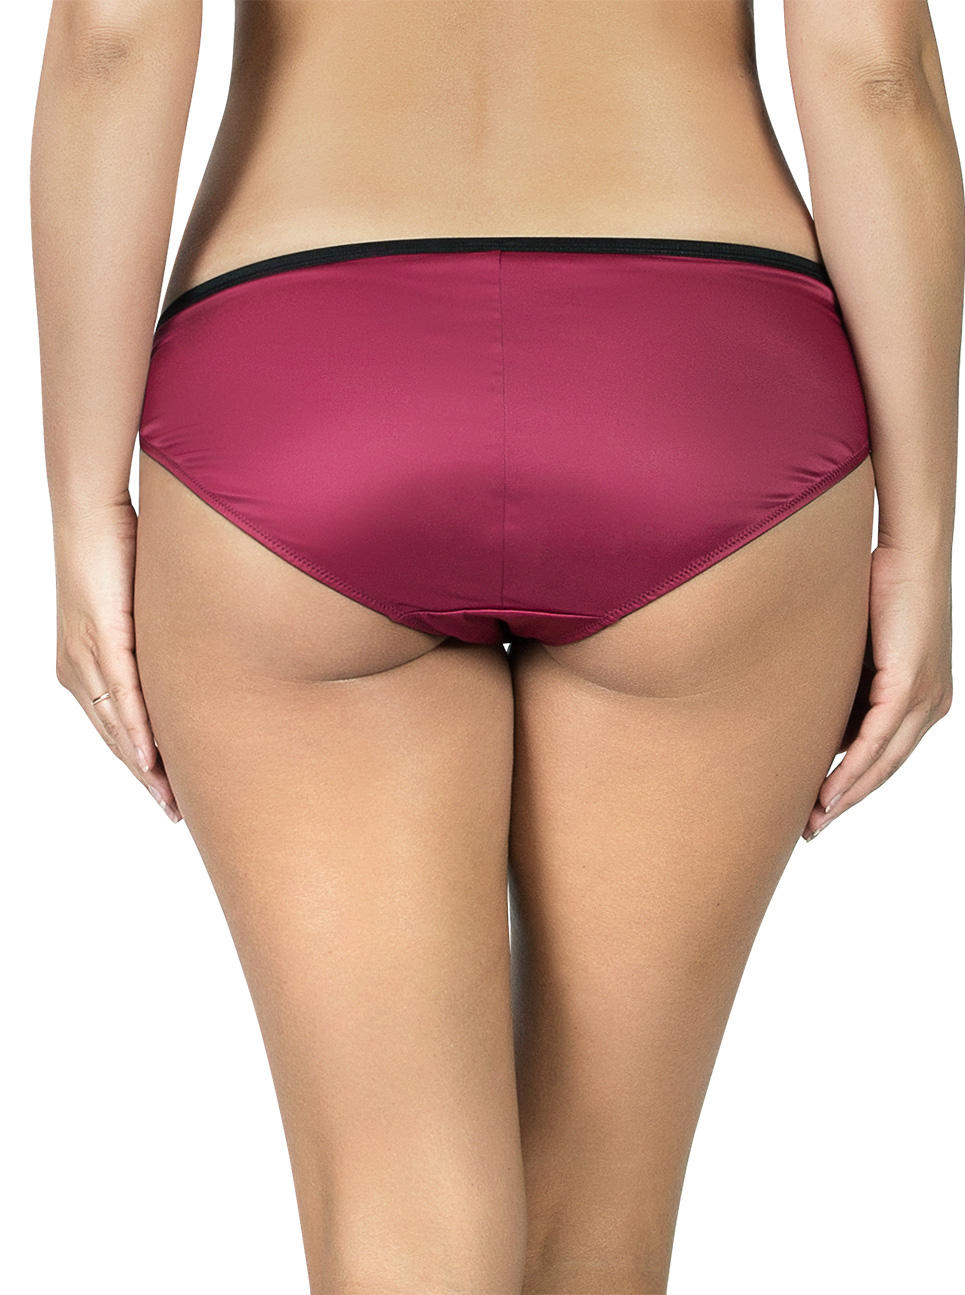 PARFAIT Charlotte Bikini6905 RioRed Back - Charlotte Bikini Rio Red 6905